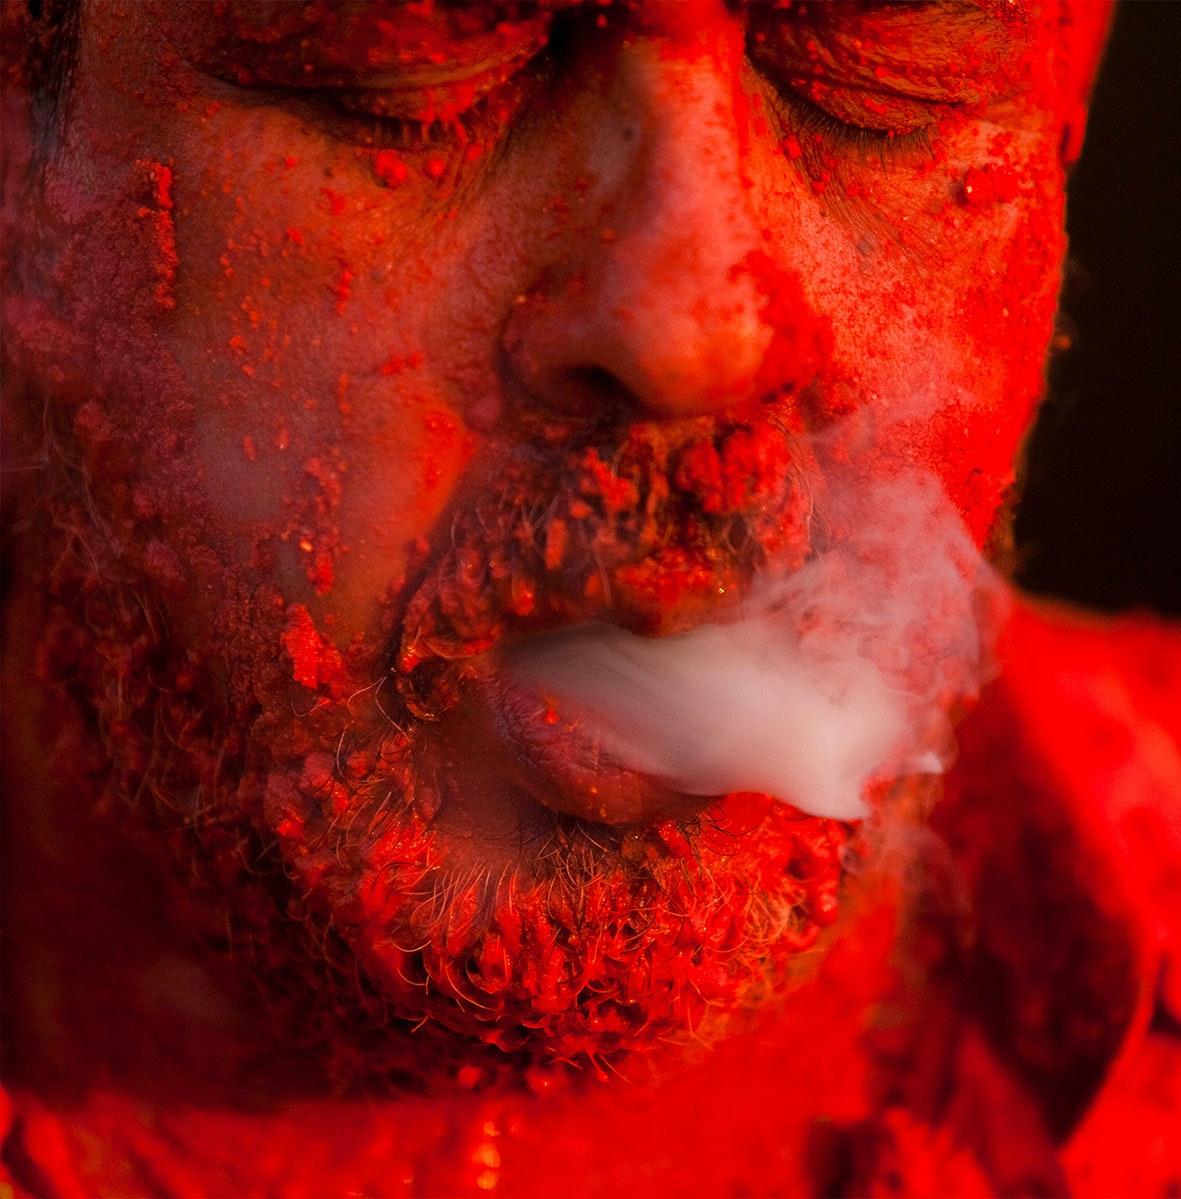 Caetano Dias, <em>Straws - Action with Annato on body at Favela Hill</em>, 2015–16. Performance. Courtesy the artist.